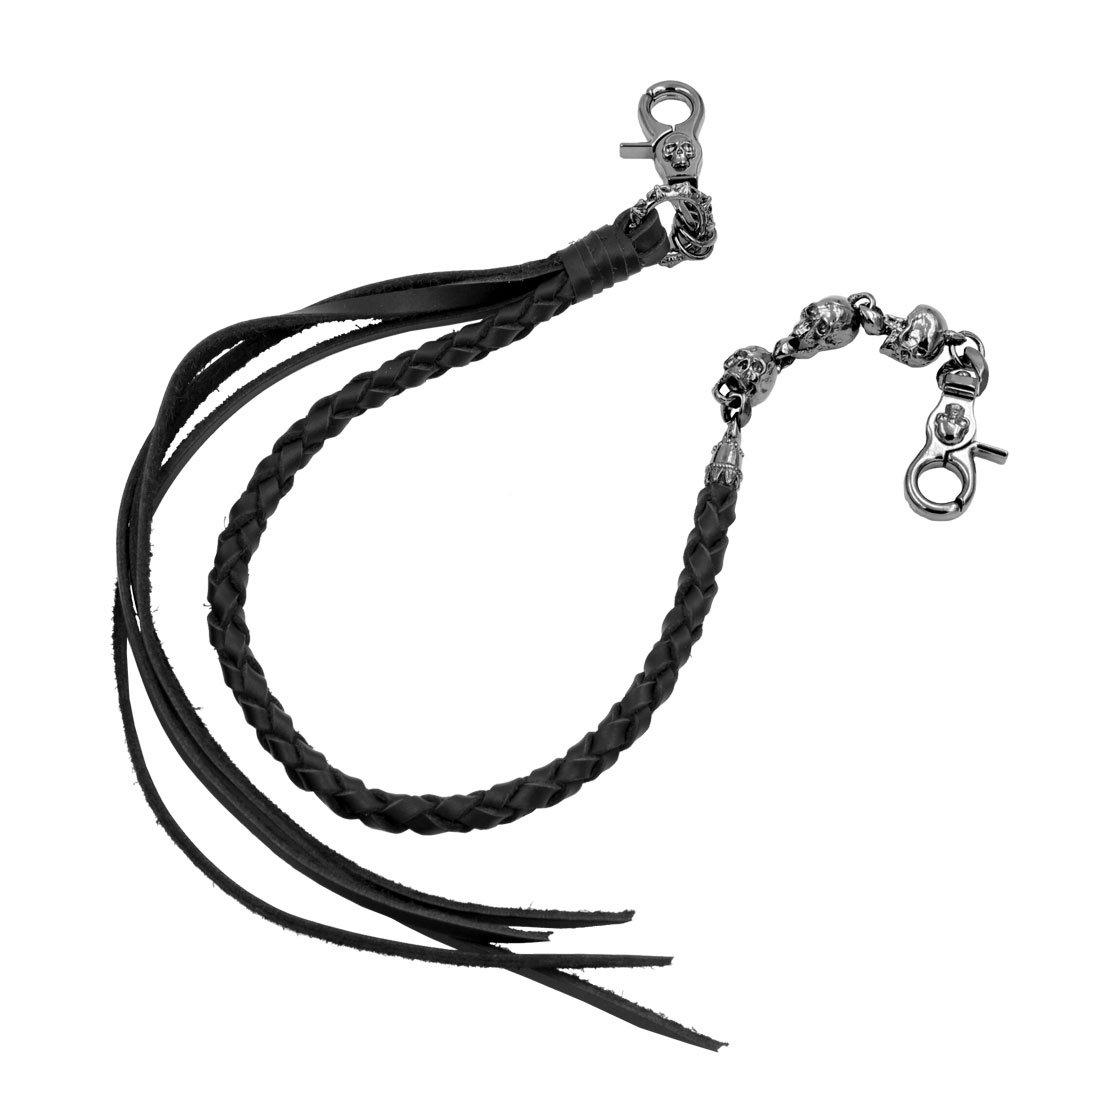 Uniqsum Braided Genuine leather wallet chain Swivel Trigger snap Biker Punk Key chain (Triple Skull B)